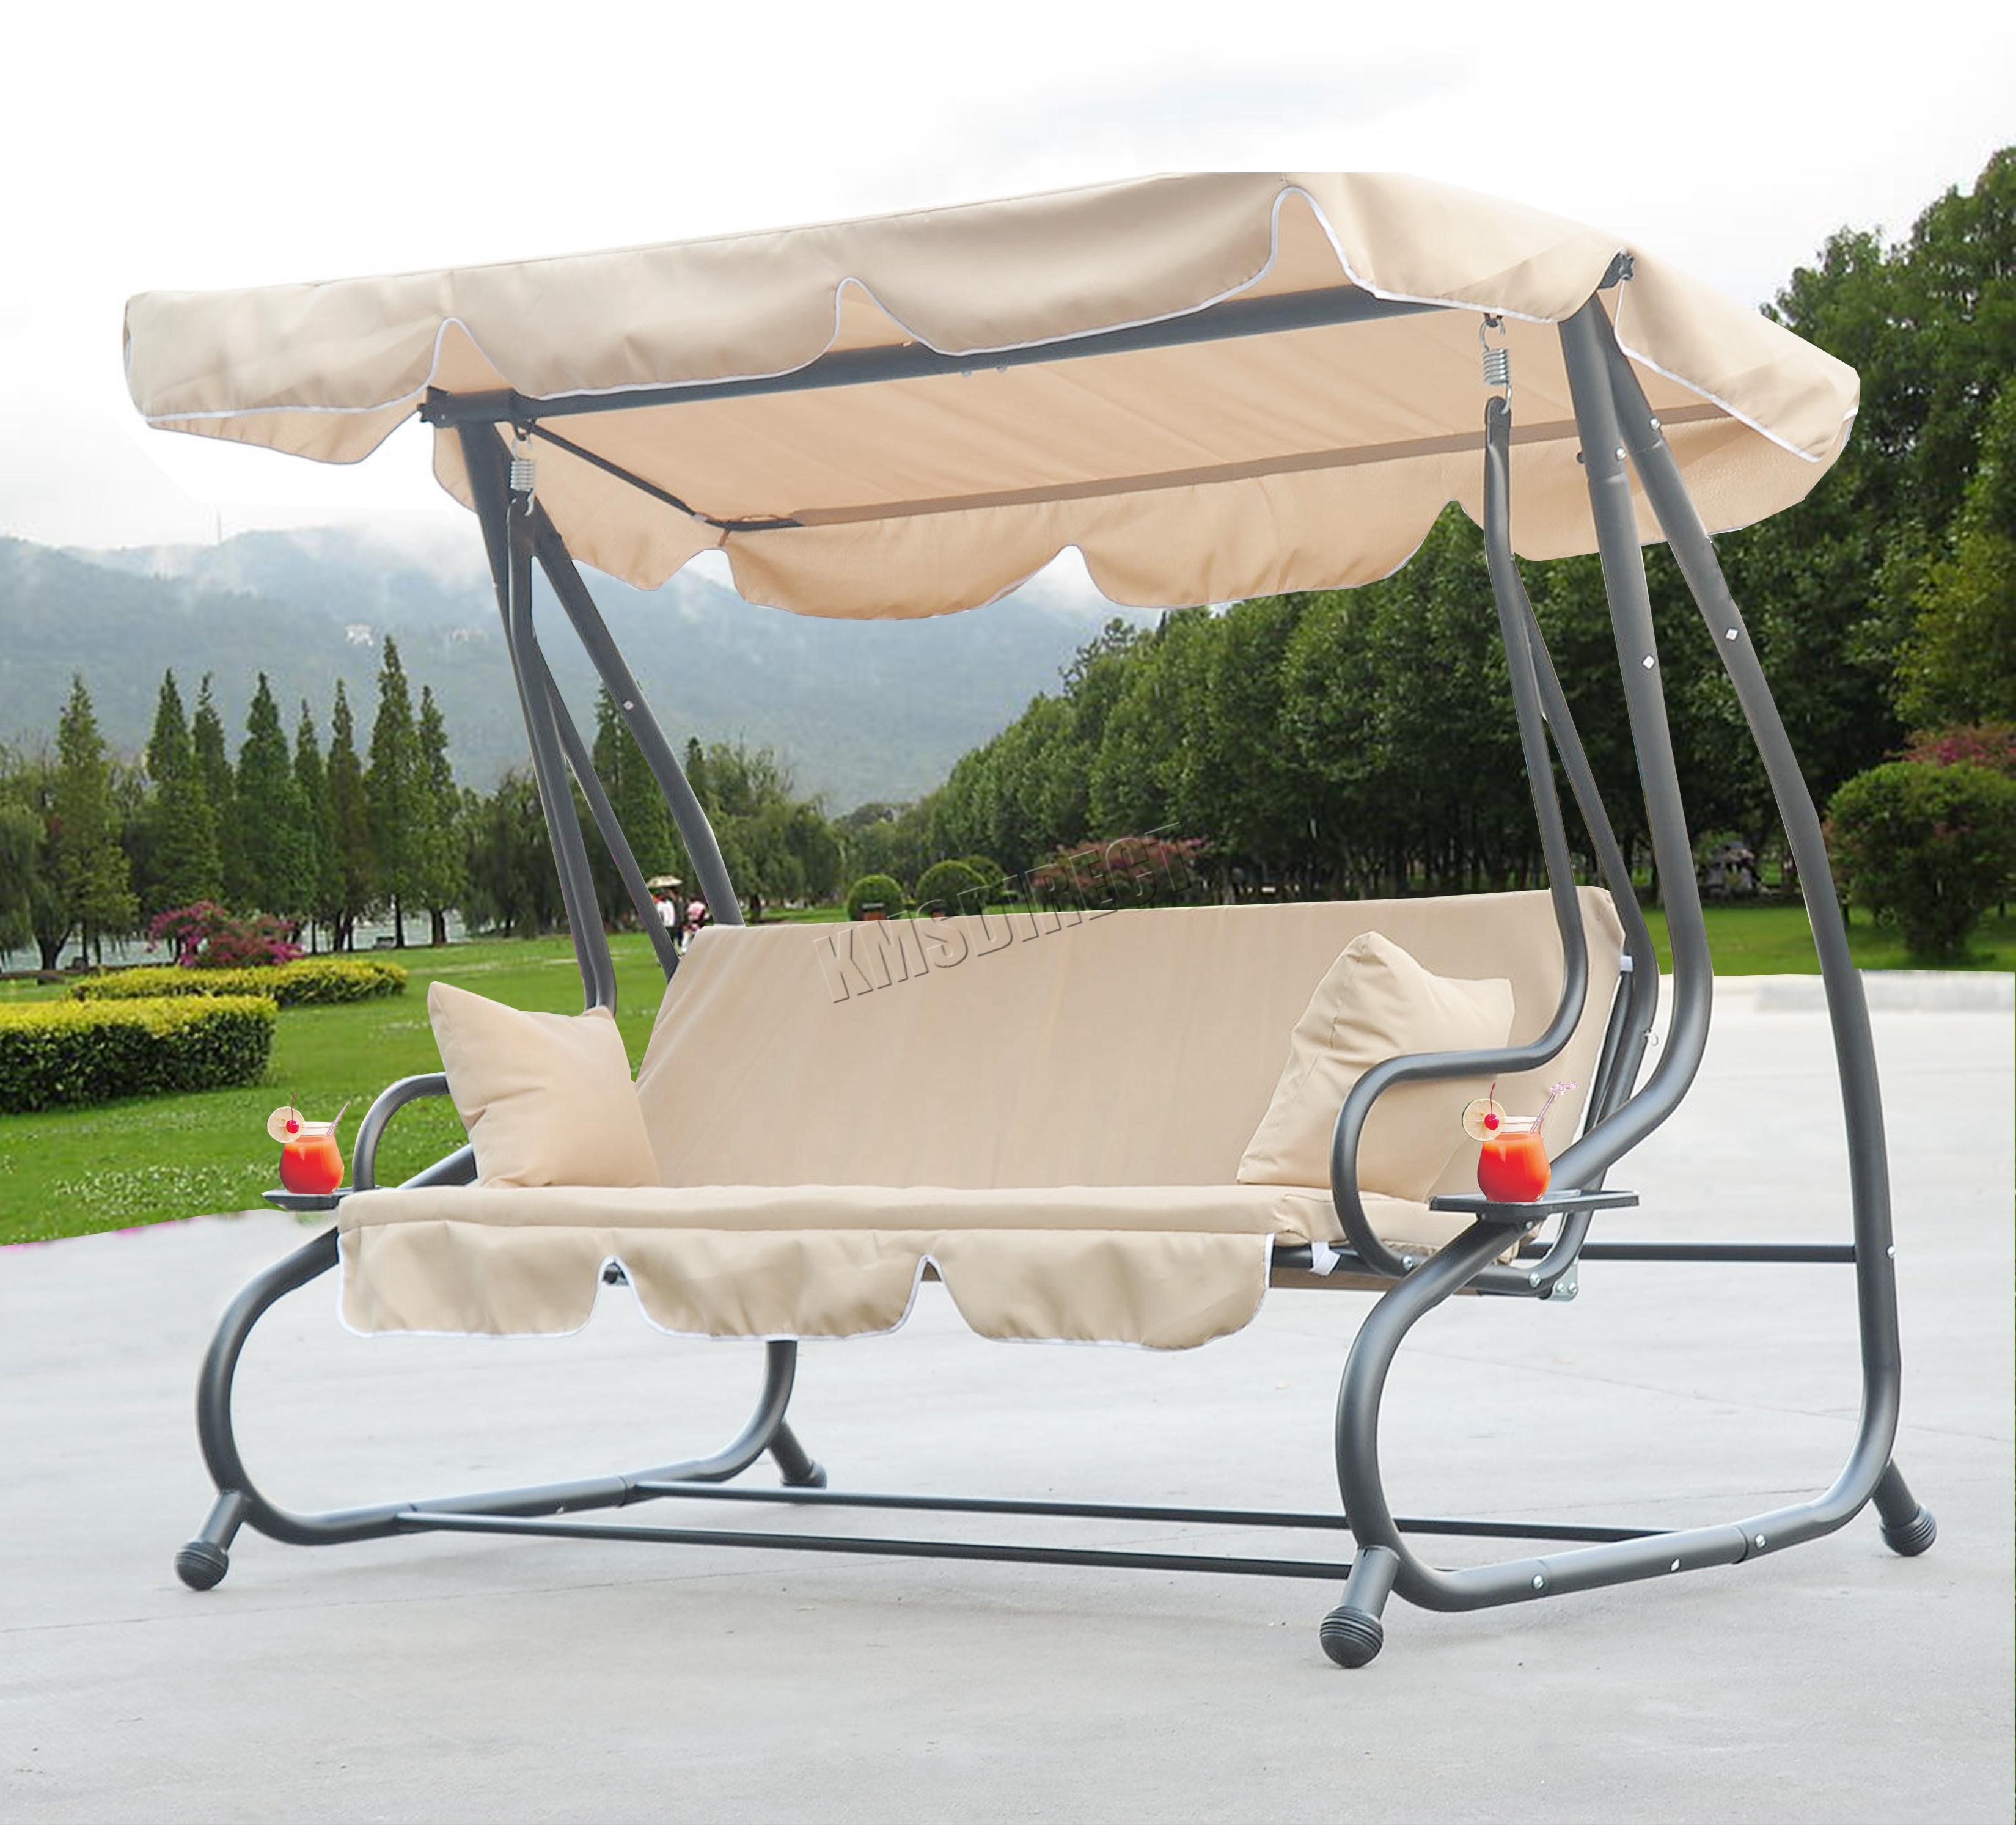 Foxhunter Beige Garden Metal Swing Hammock 3 Seater Chair Bed Patio